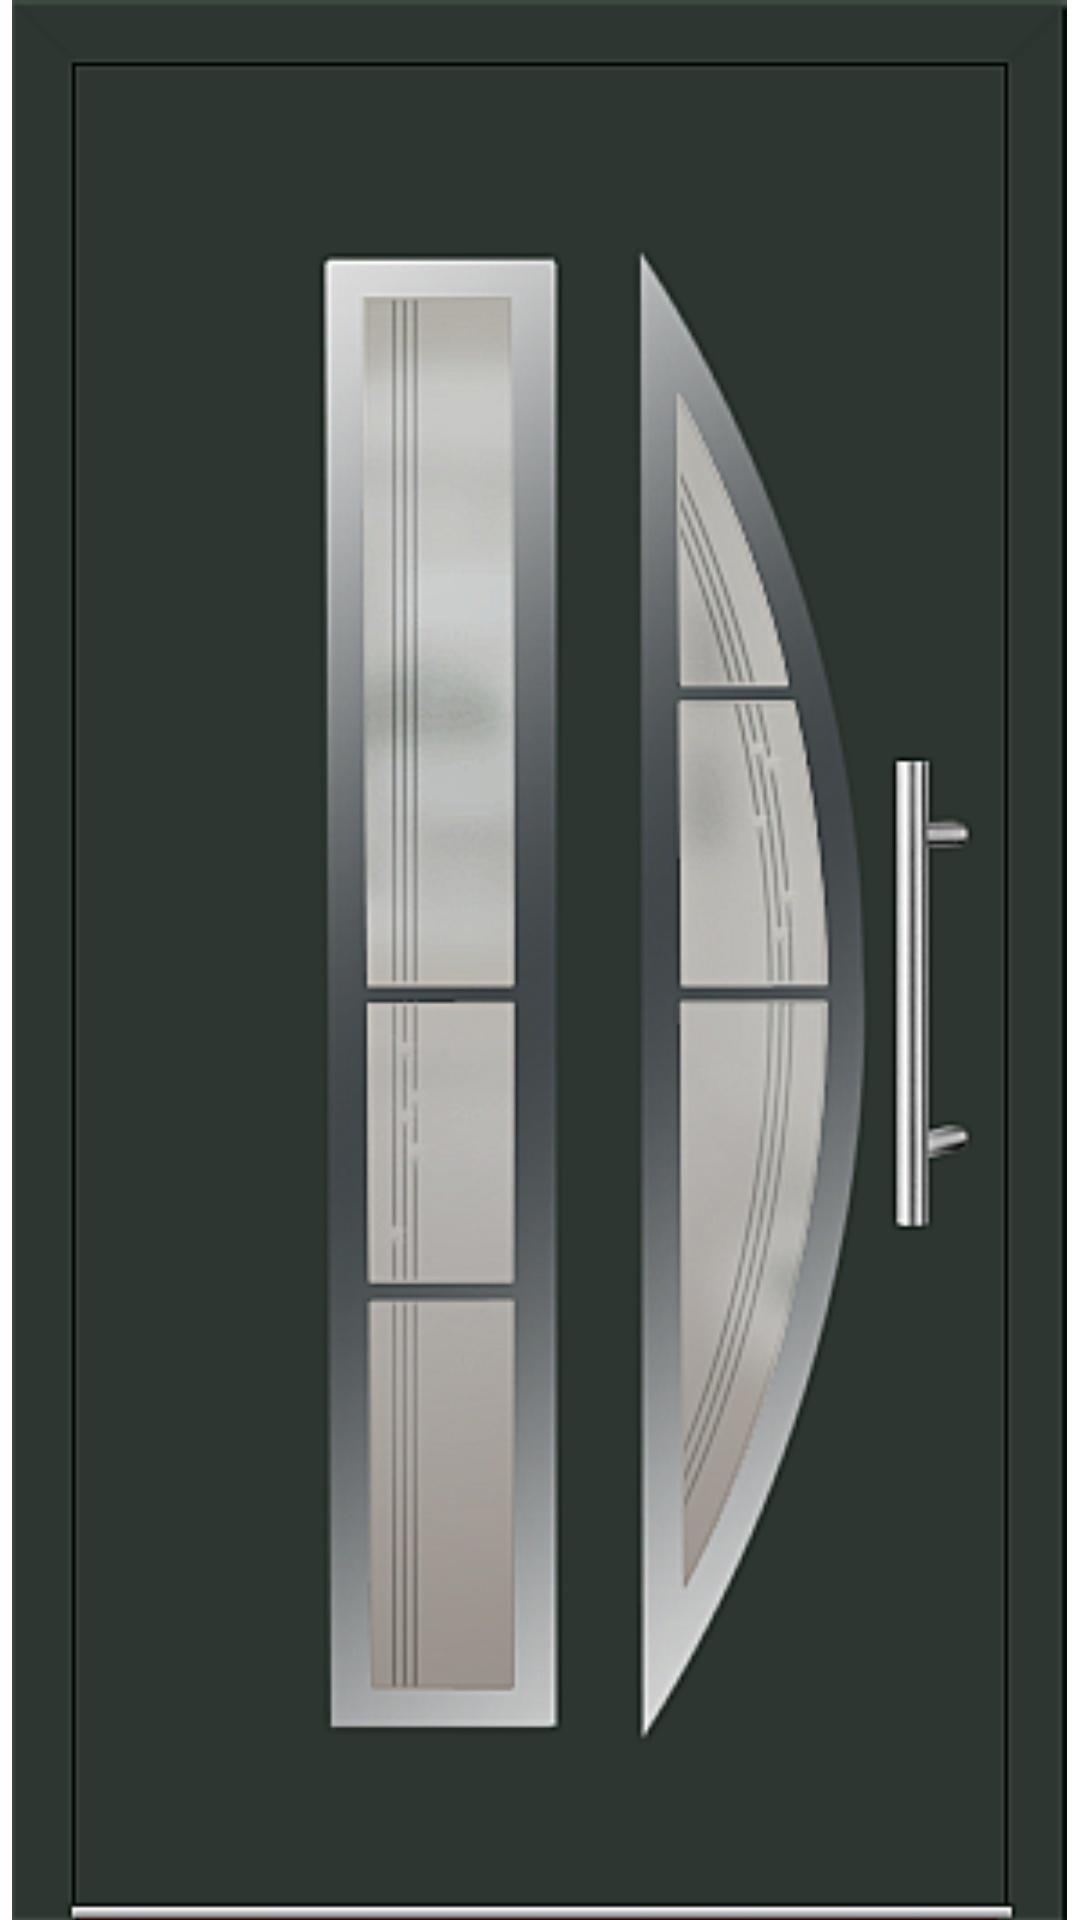 Aluminium Haustür Modell 6525-75 tannengrün